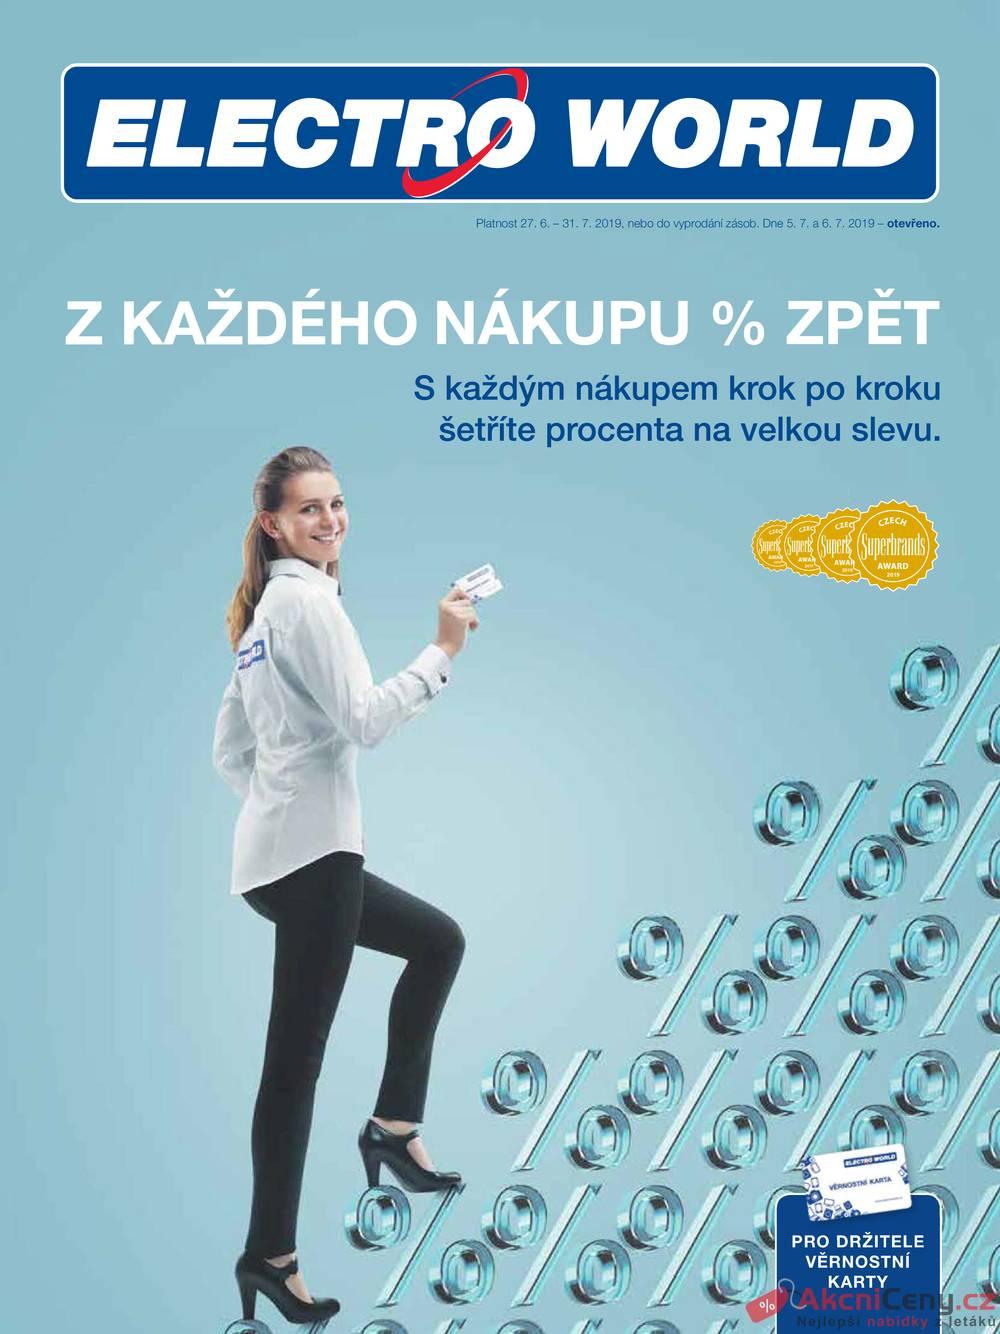 Leták Electro World - Electro World  od 27.6. do 31.7.2019 - strana 1